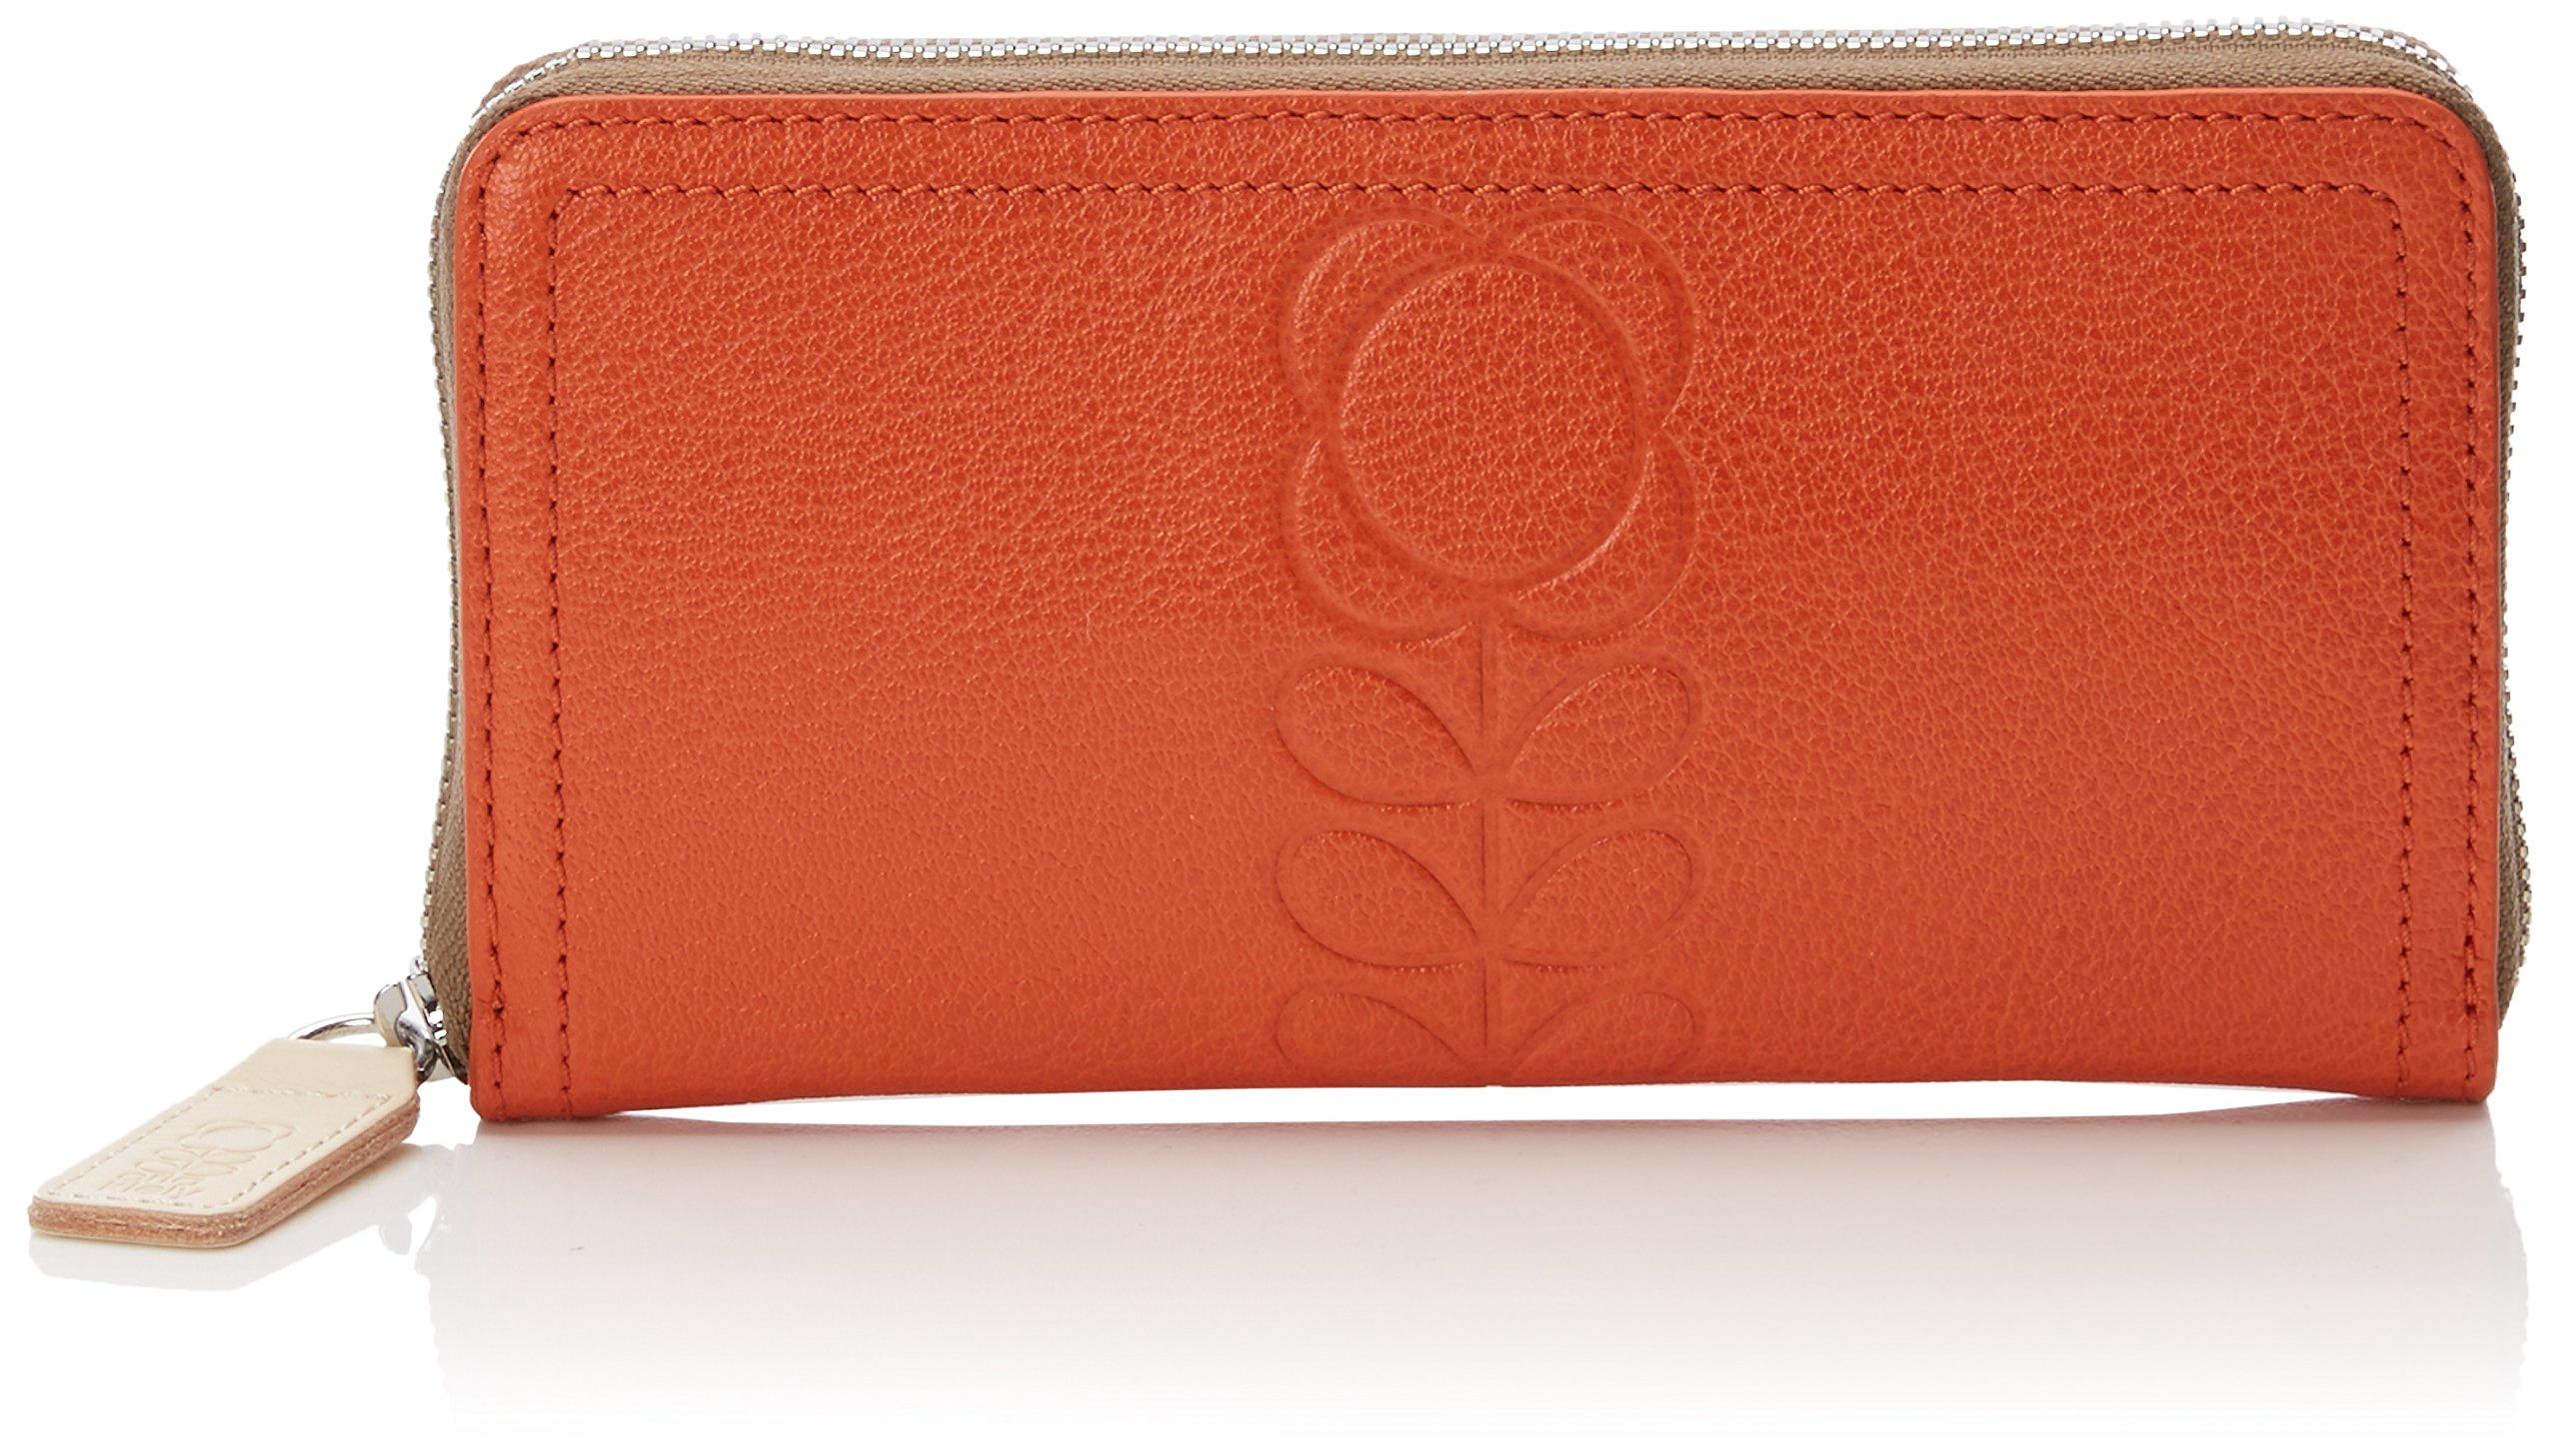 Embossed Flower Leather Big Wallet Wallet, Orange, One Size by Orla Kiely (Image #1)